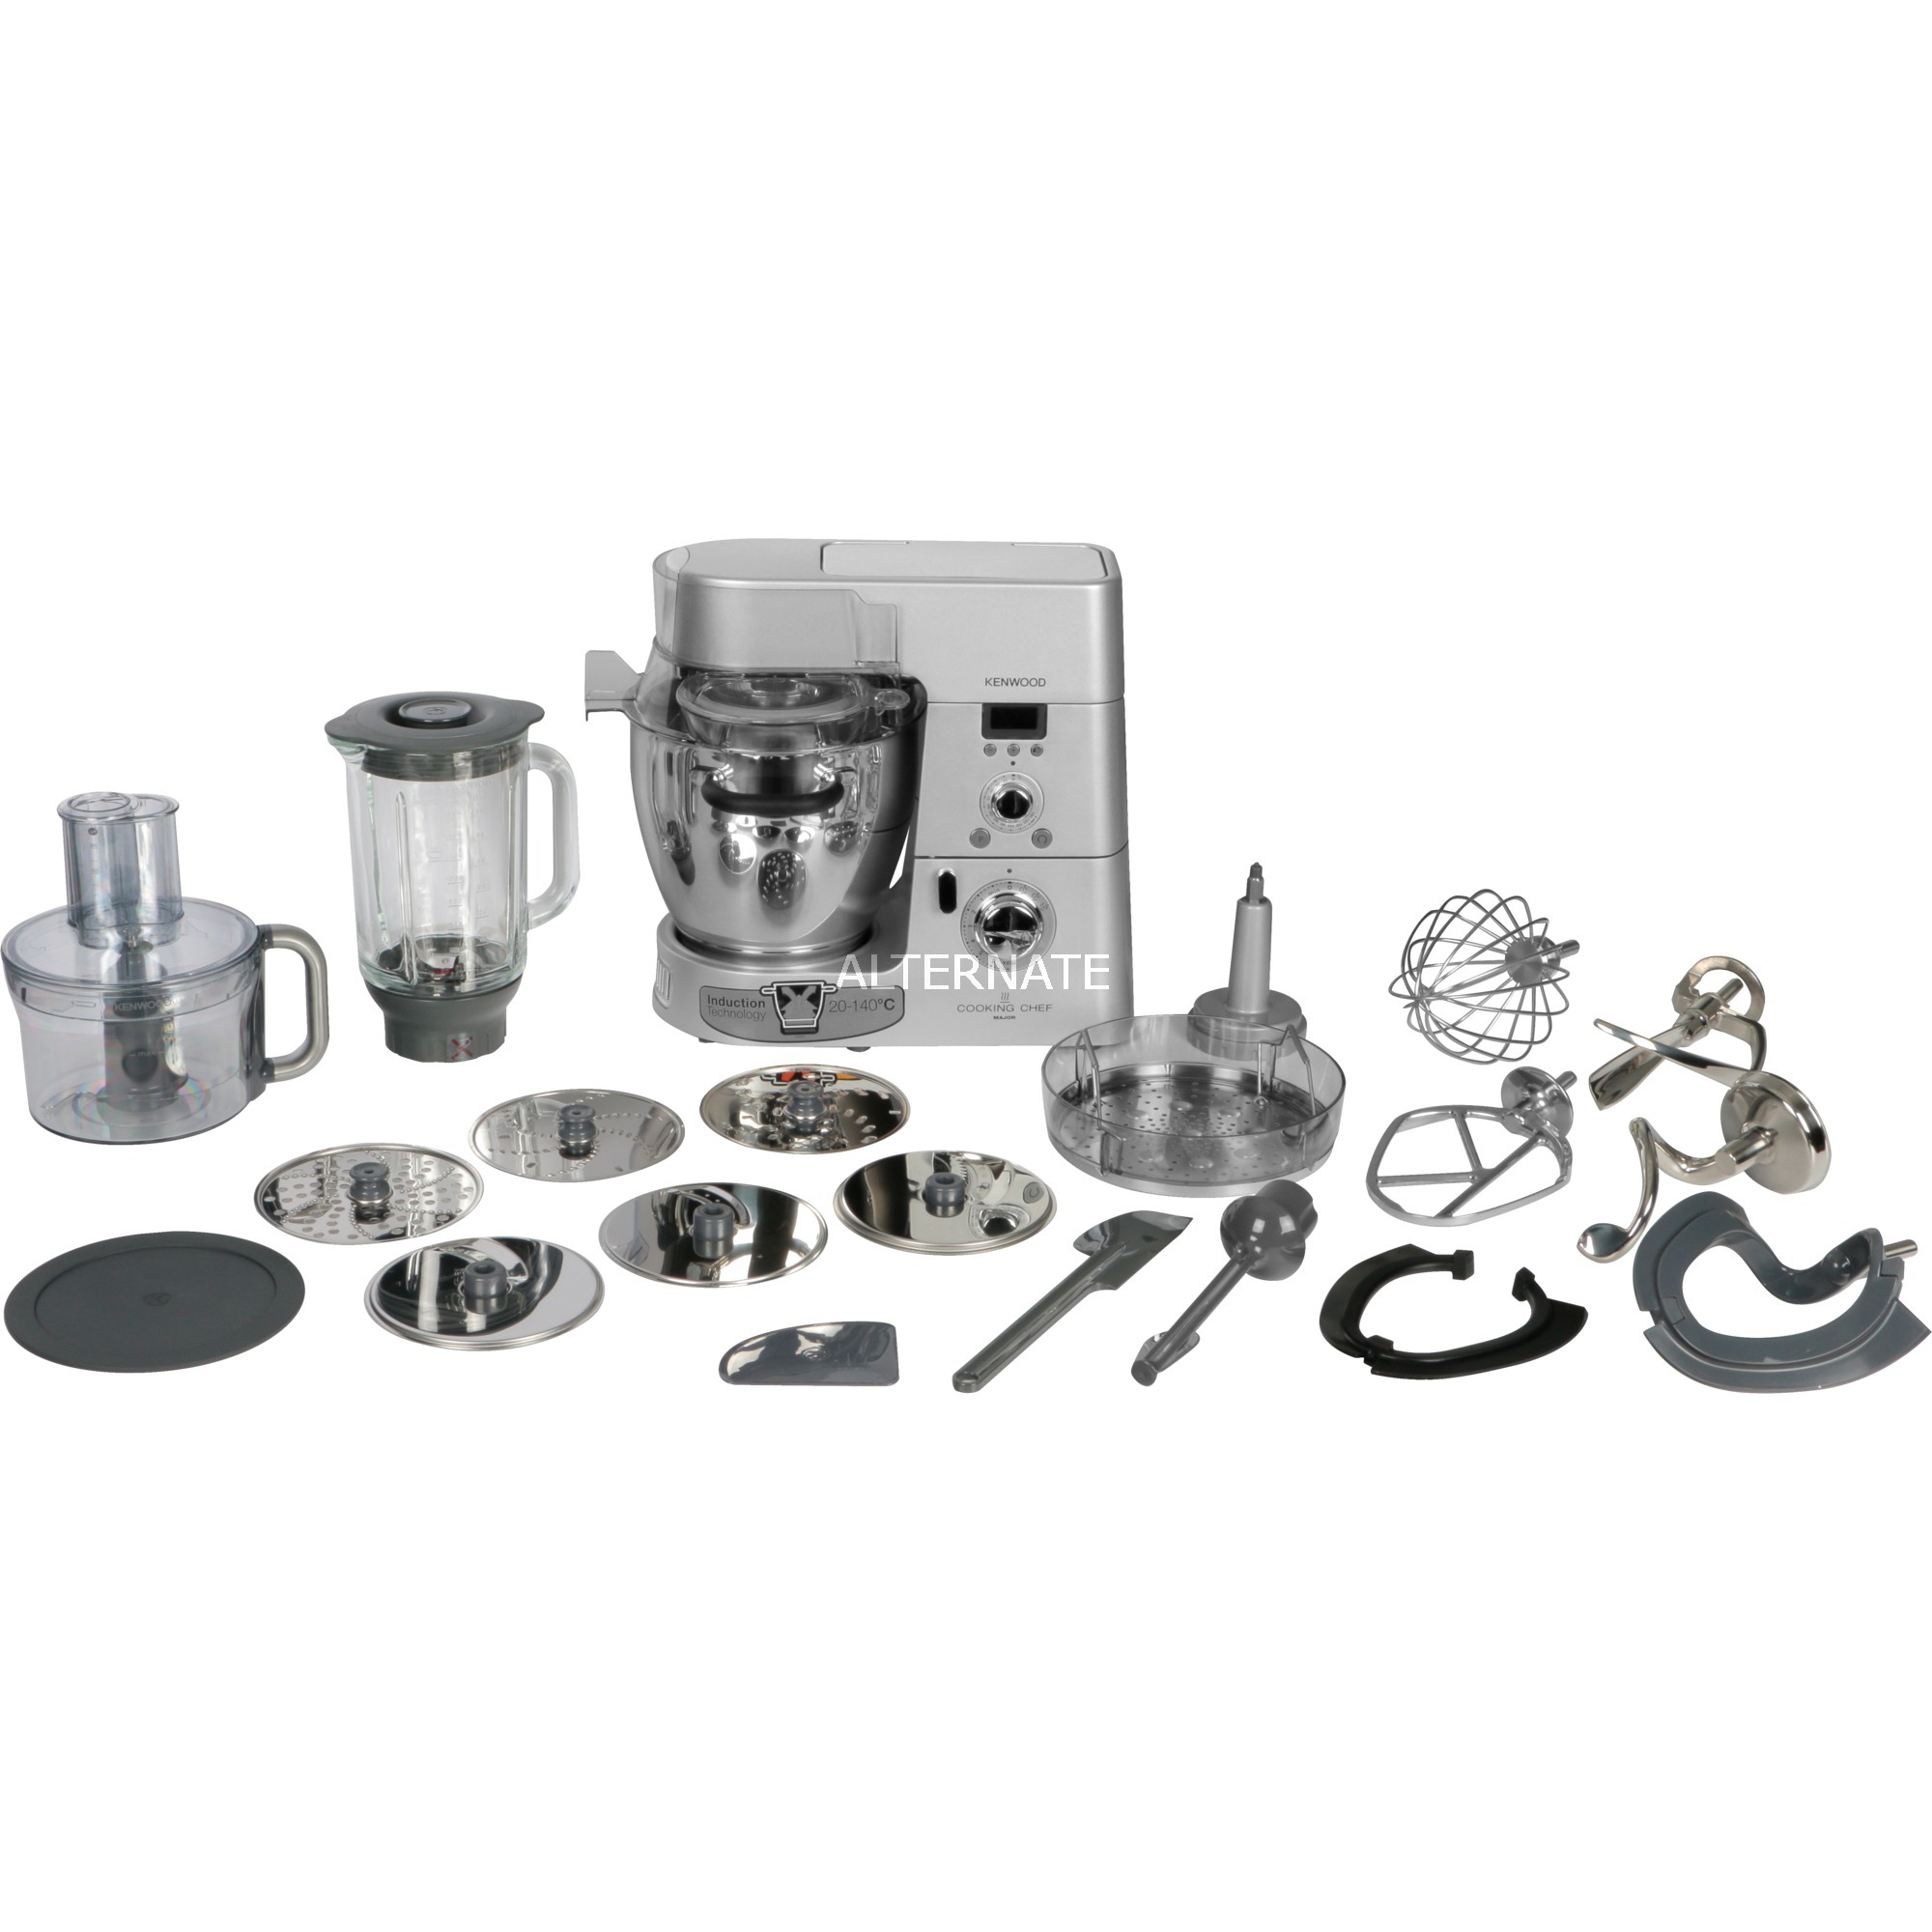 KM096 1500W 6.7L Plata robot de cocina